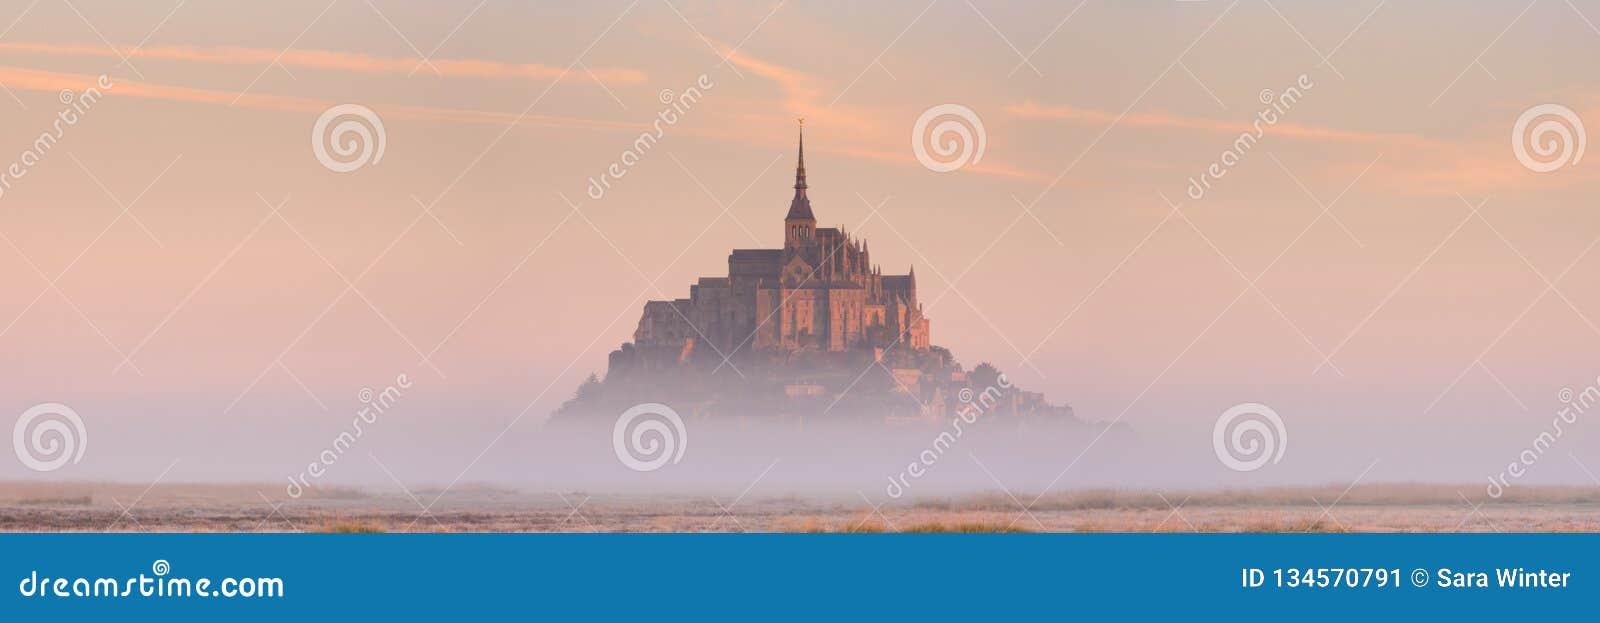 Le Mont Saint Michel in Normandie, Frankreich bei Sonnenaufgang